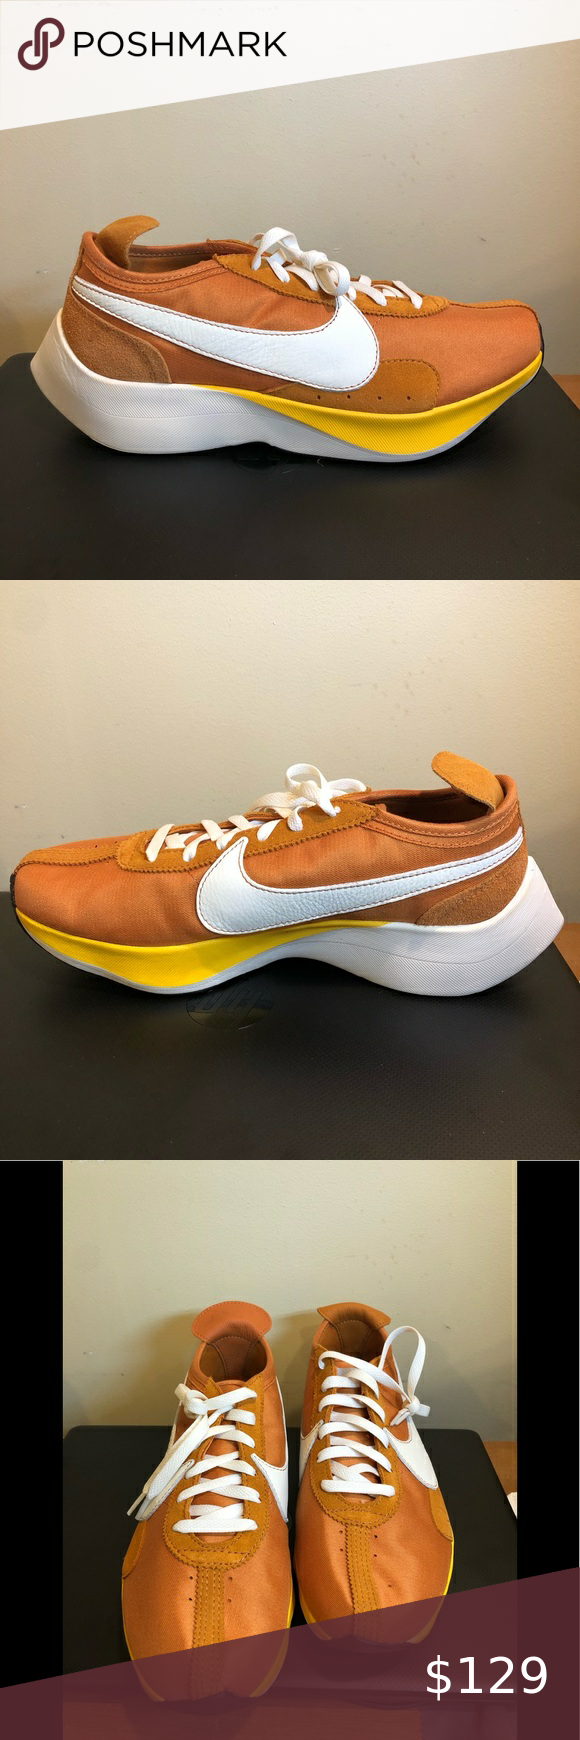 Nike Moon Racer Bv7779 800 Men Running Shoe Sz 11 Nike Moon Racer Qs Bv7779 800 Men Running Shoes Mona In 2020 Running Shoes For Men Man Running Mens Shoes Sneakers